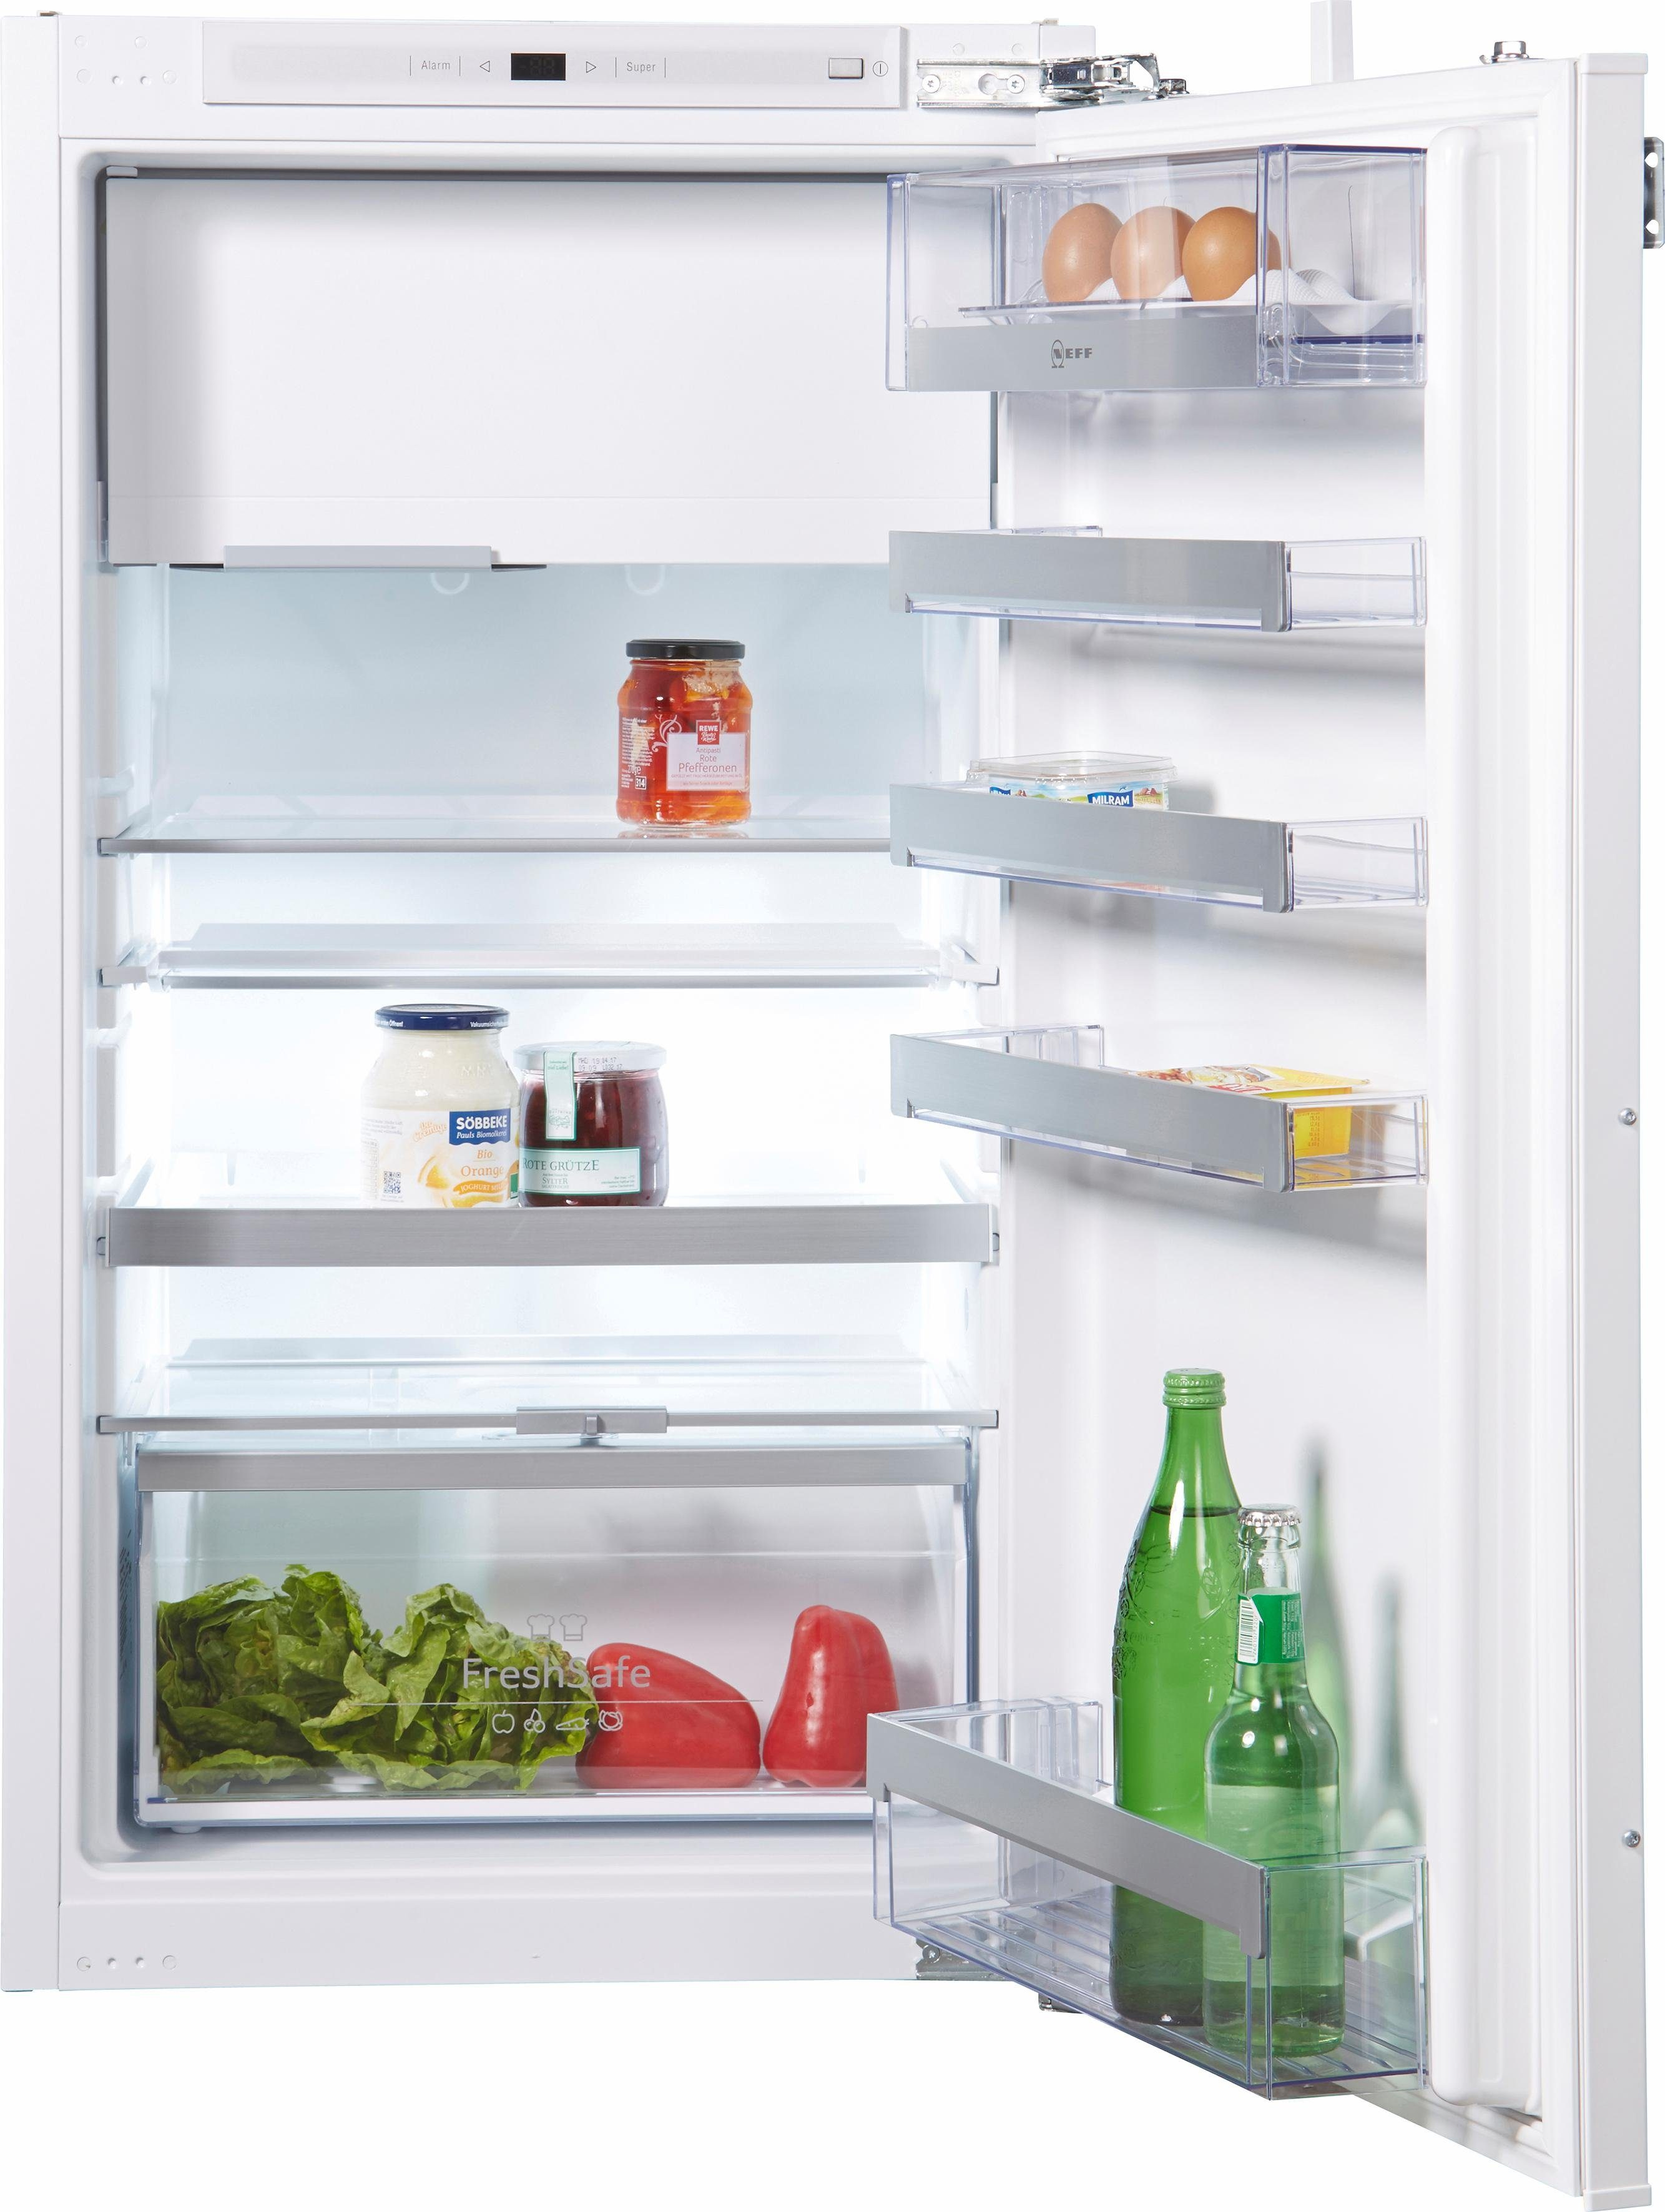 Neff Integrierbarer Einbaukühlschrank K345A2 / KI2323F30